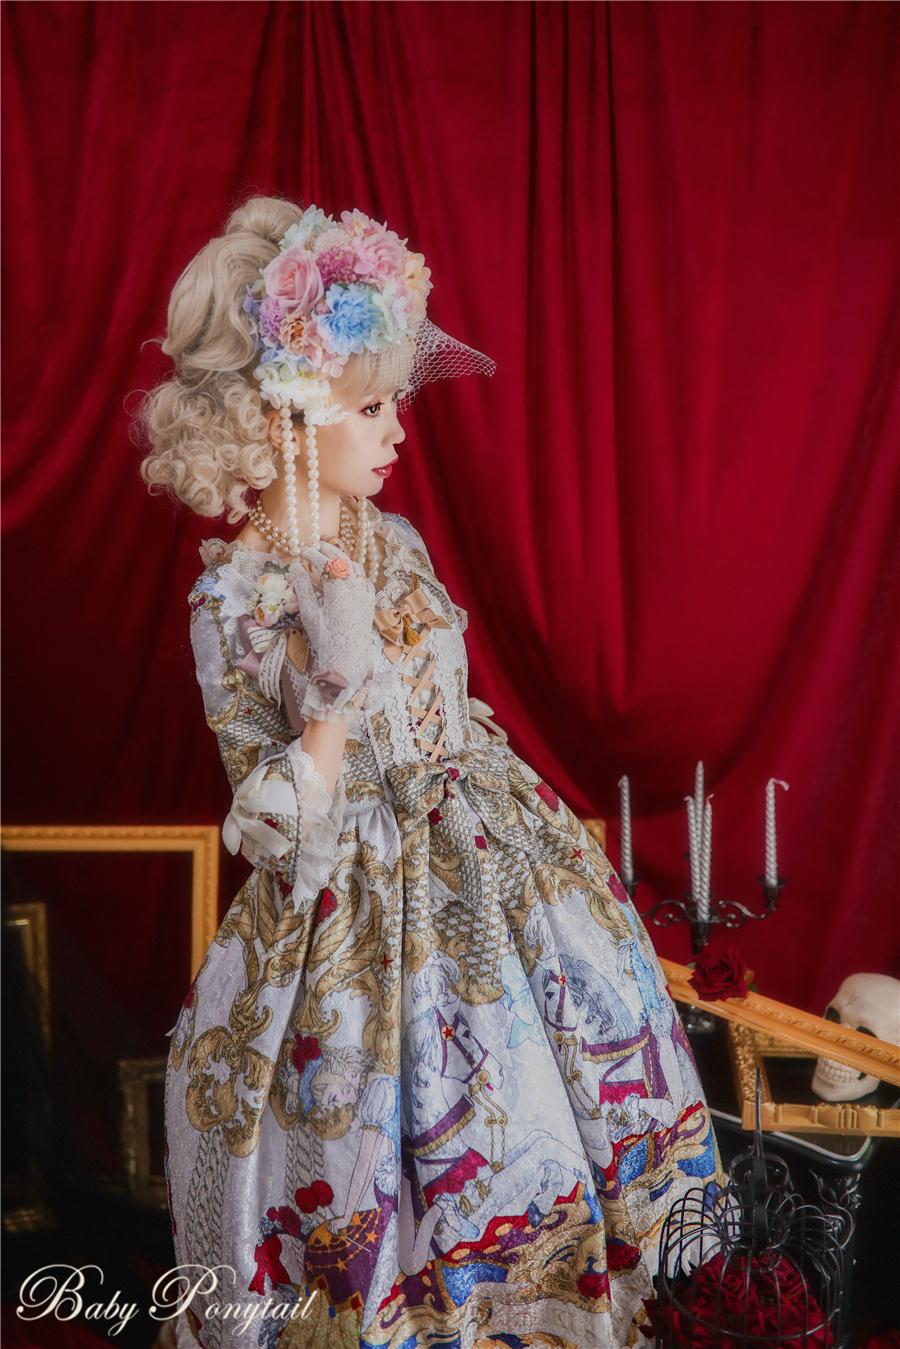 Baby Ponytail_Circus Princess_Silver OP_Kaka_12.jpg